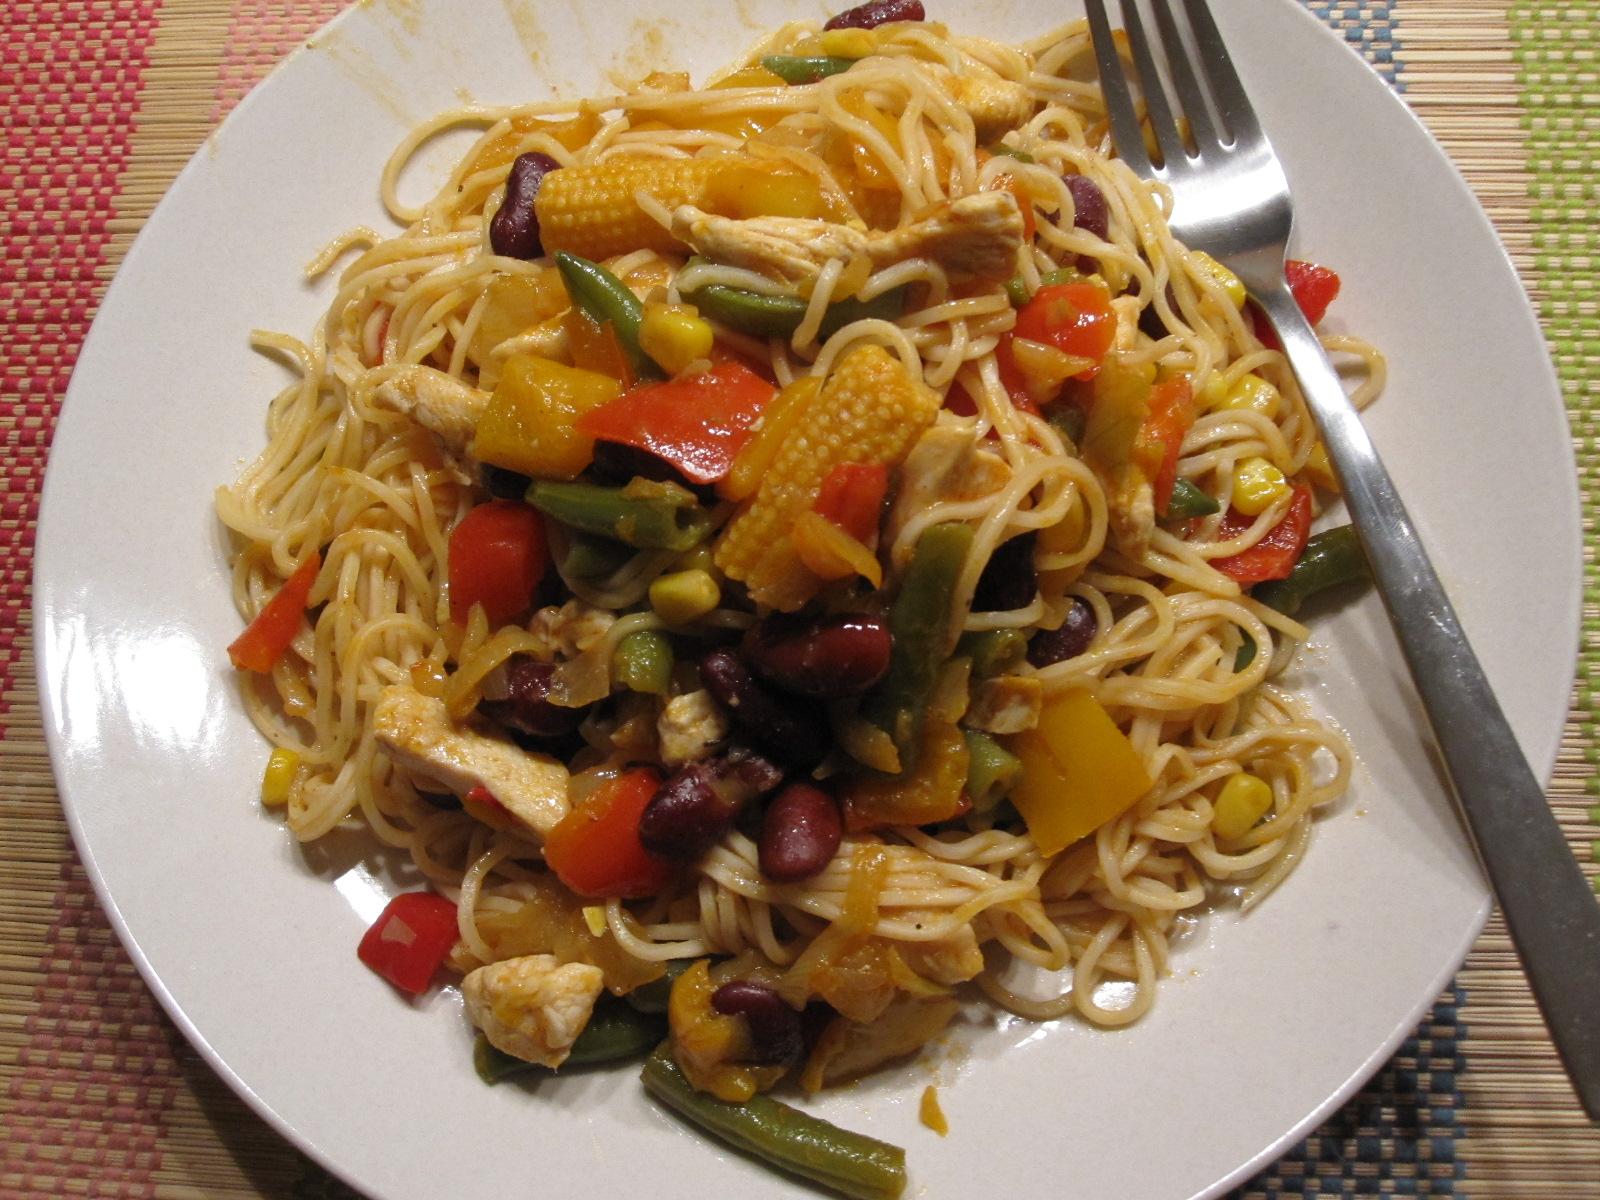 Makarna tarifleri firinda asya usulu makarna tarifi resimli yemek